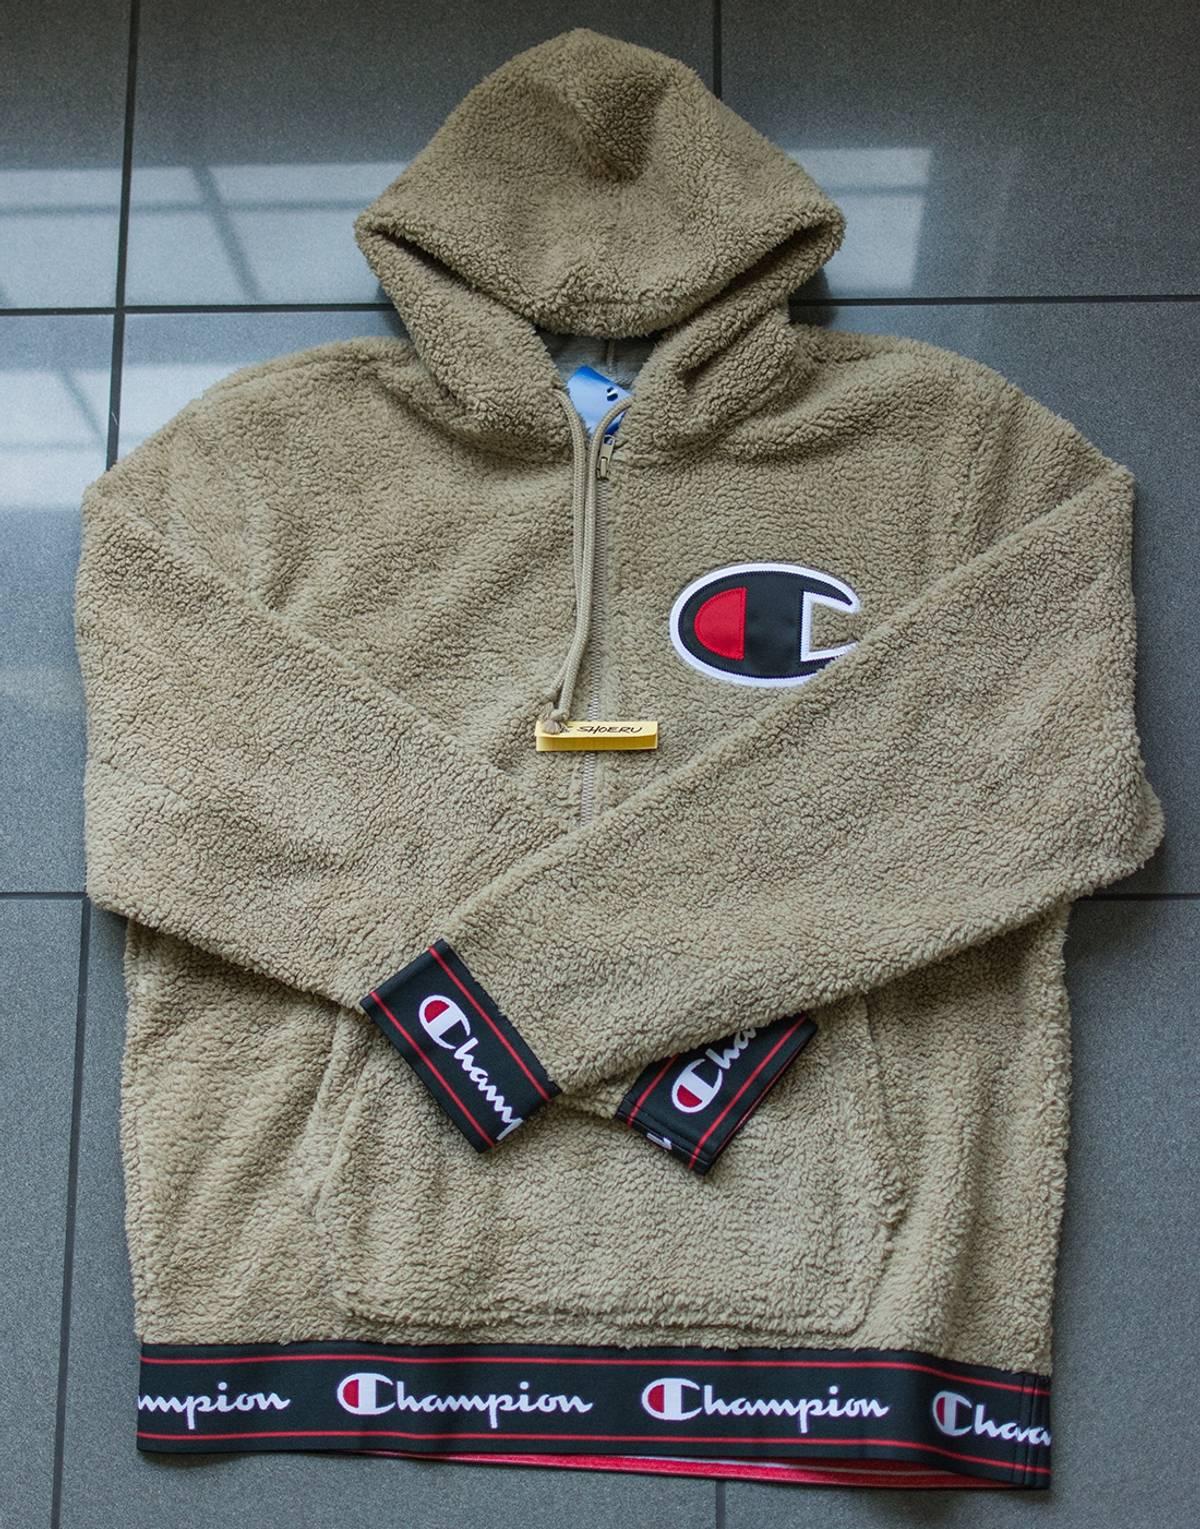 223bbd194d25 Champion Sherpa Half Zip Pullover Hoodie - Khaki Tan (IN HAND) Size l -  Sweatshirts   Hoodies for Sale - Grailed